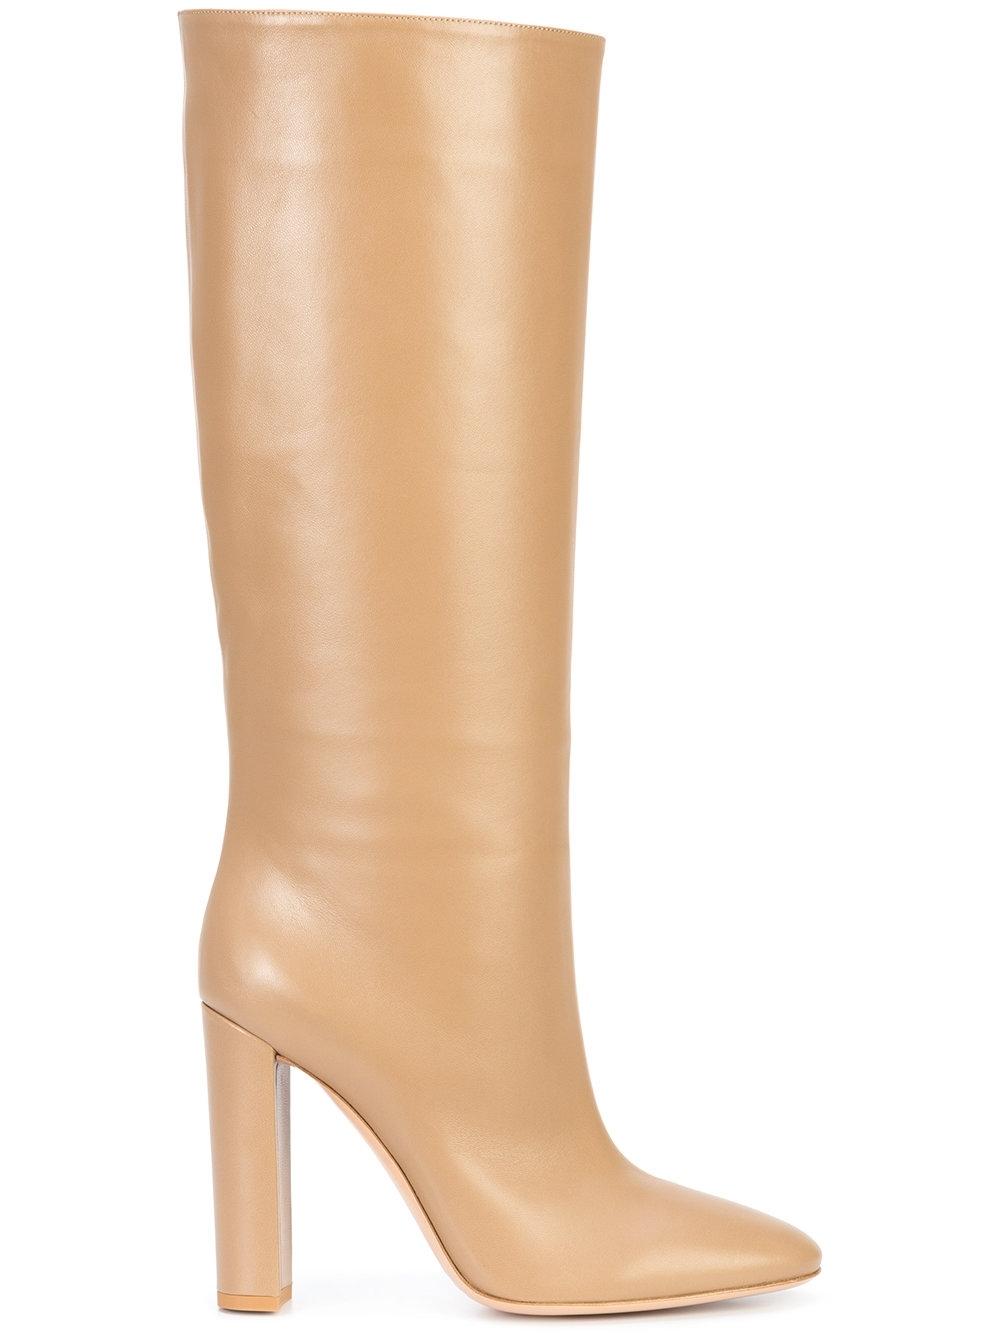 KirnaZabete-Gianvito-Rossi-Slouchy-Heel-Boots-31.jpg